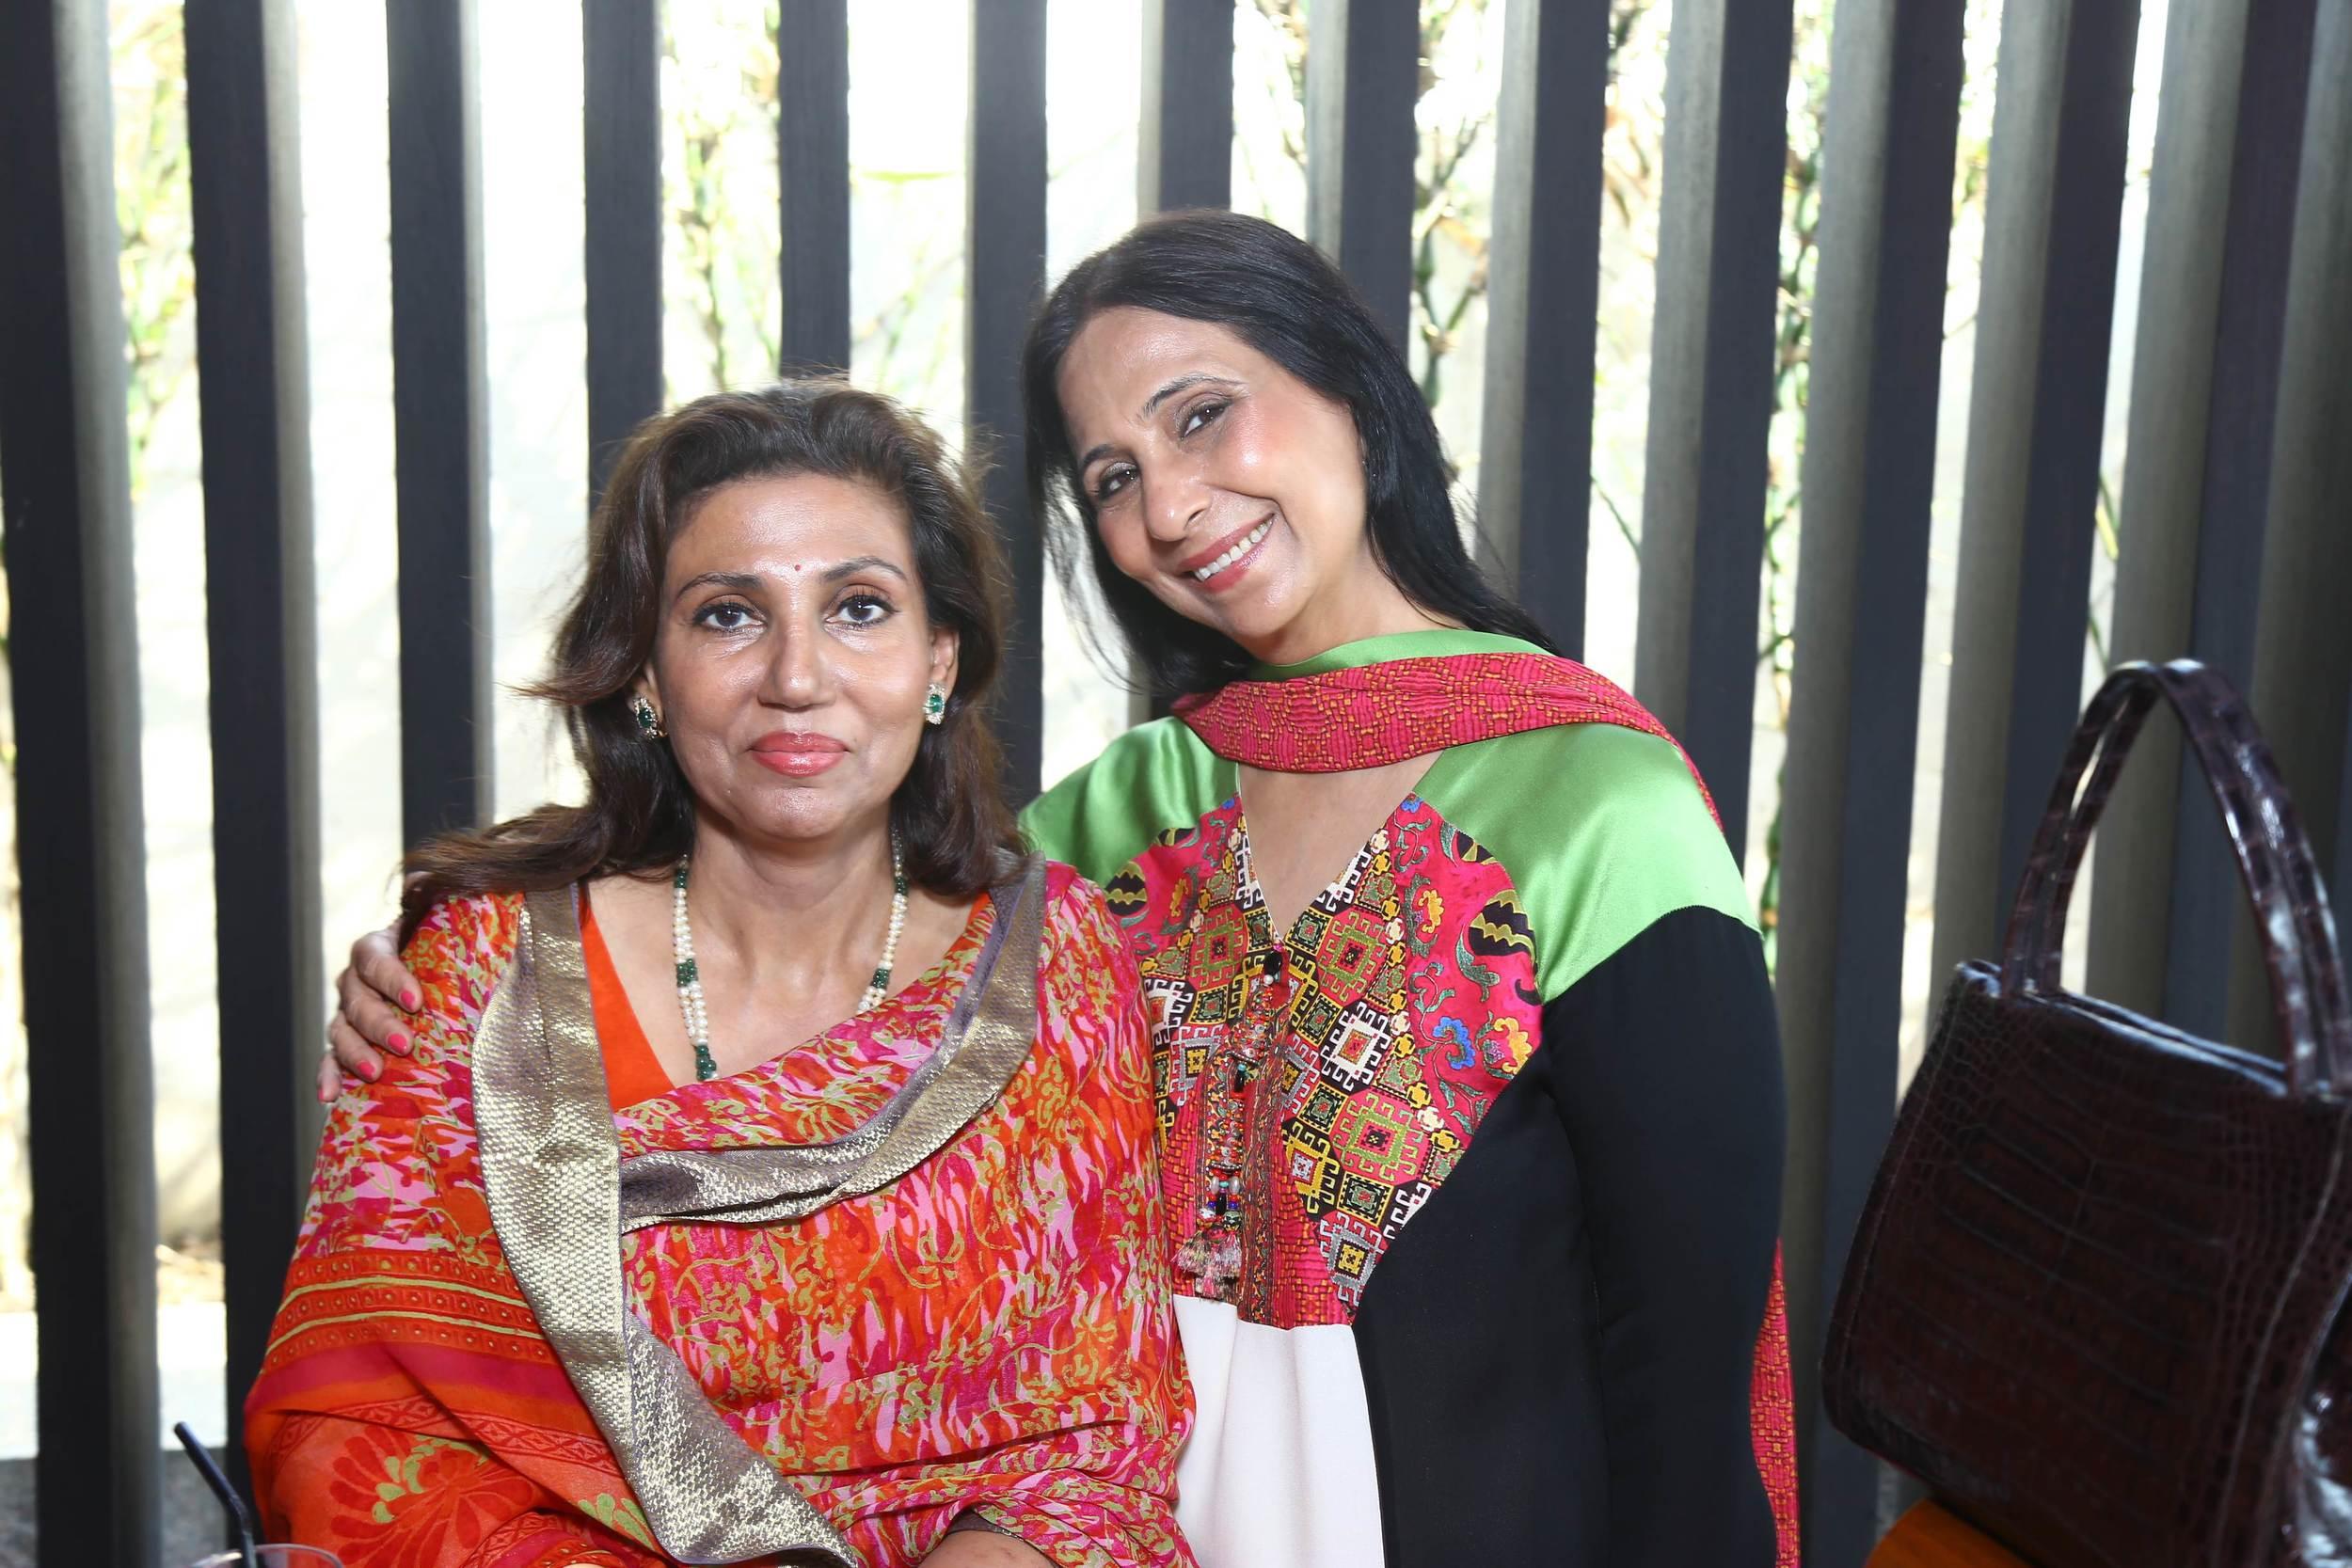 DLF Emporio - Women's Day - Rani Reema Singh with Leena Singh (Ashima Leena).jpg